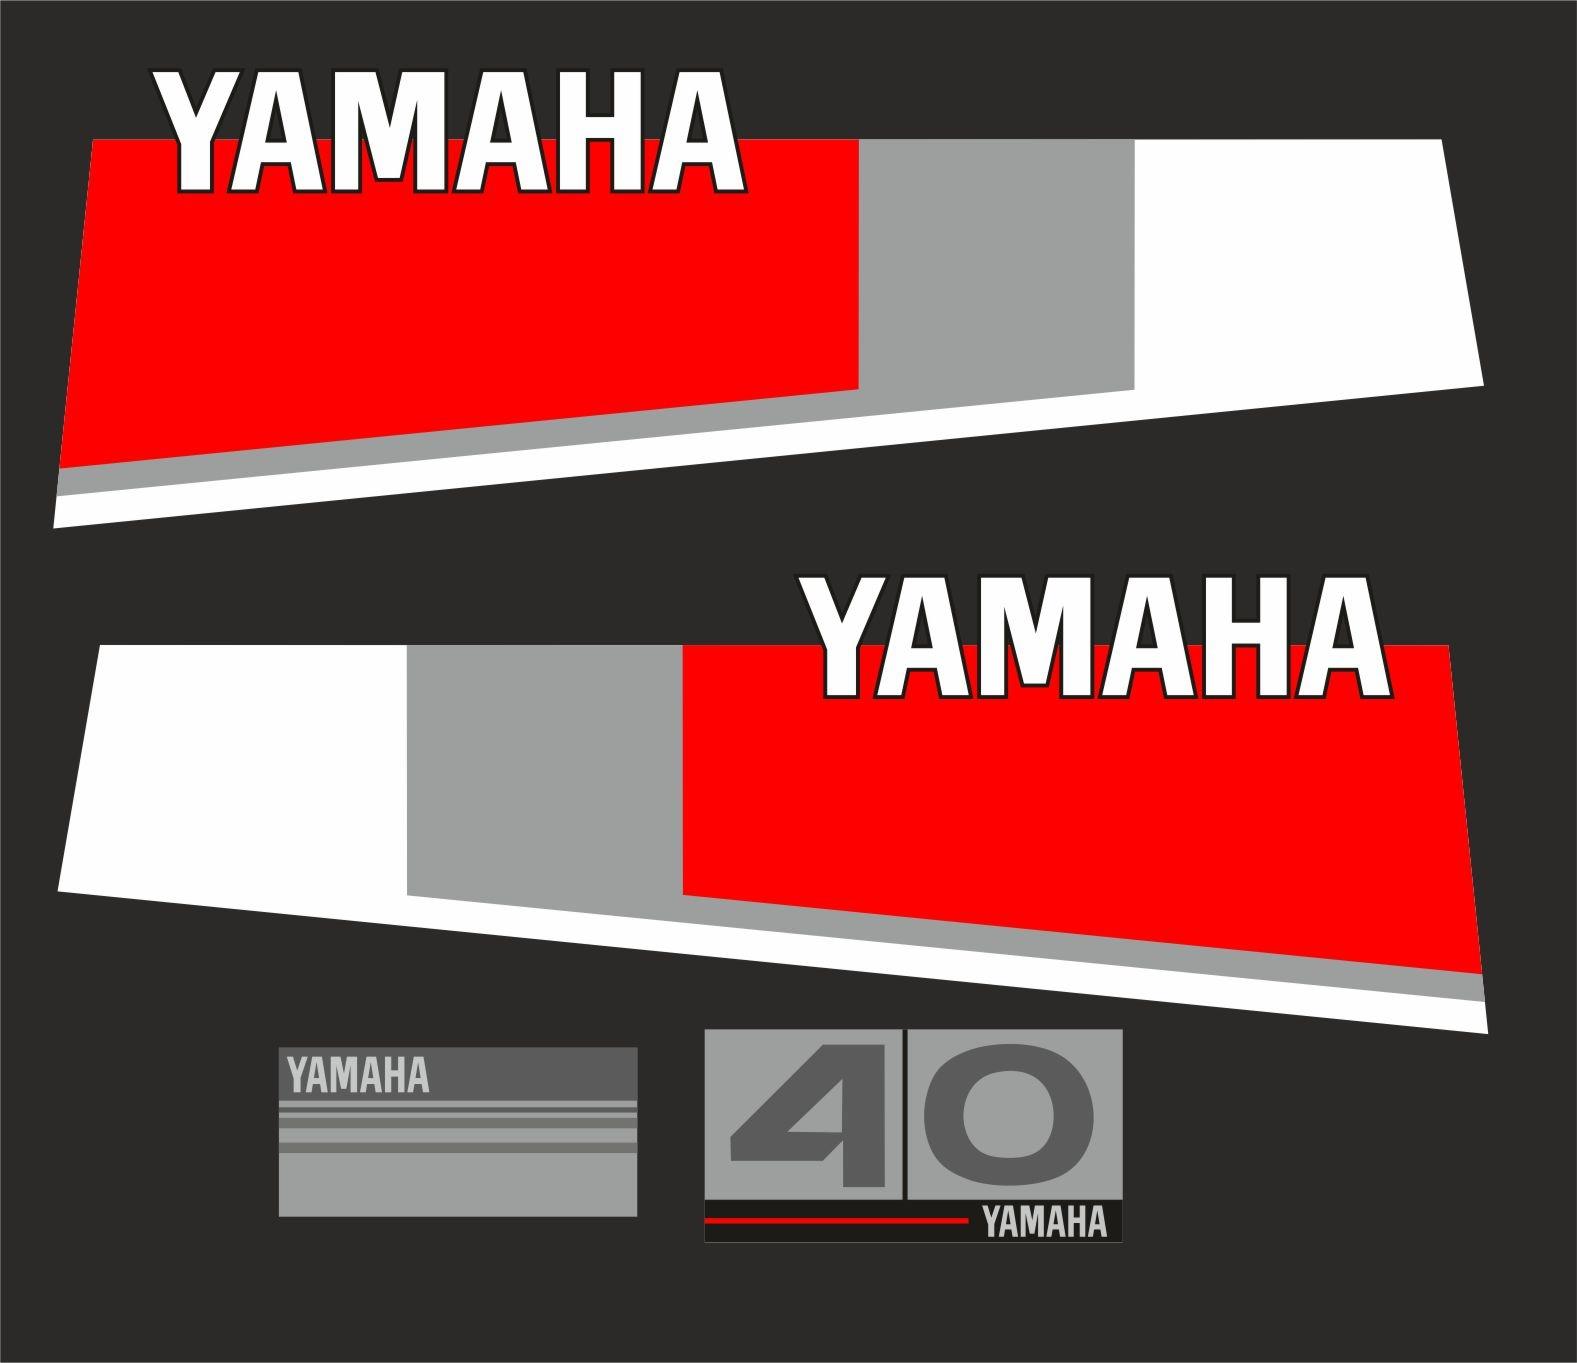 Yamaha 40 bouwjaar 1984 – 1987 Sticker set